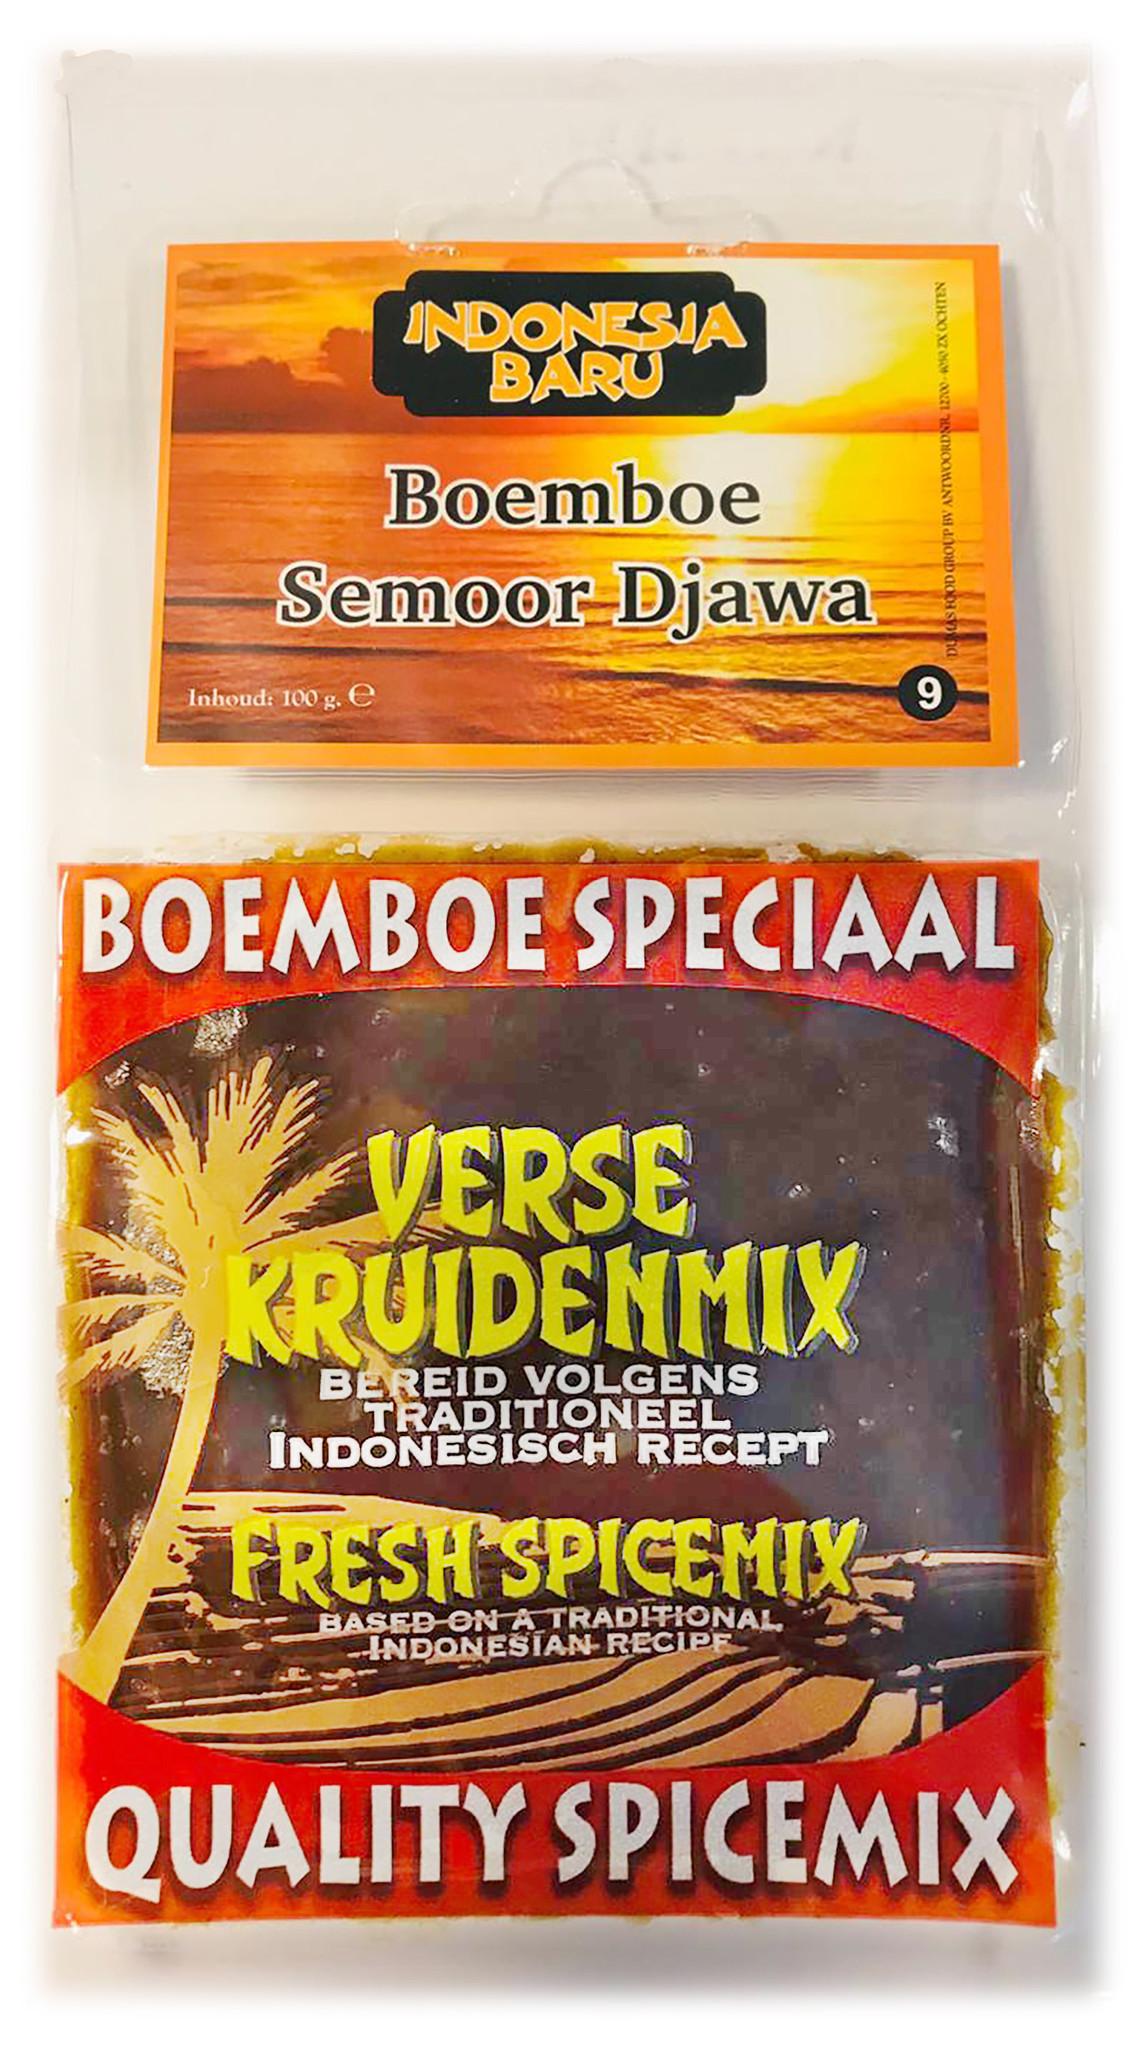 Boemboe Semoor Djawa